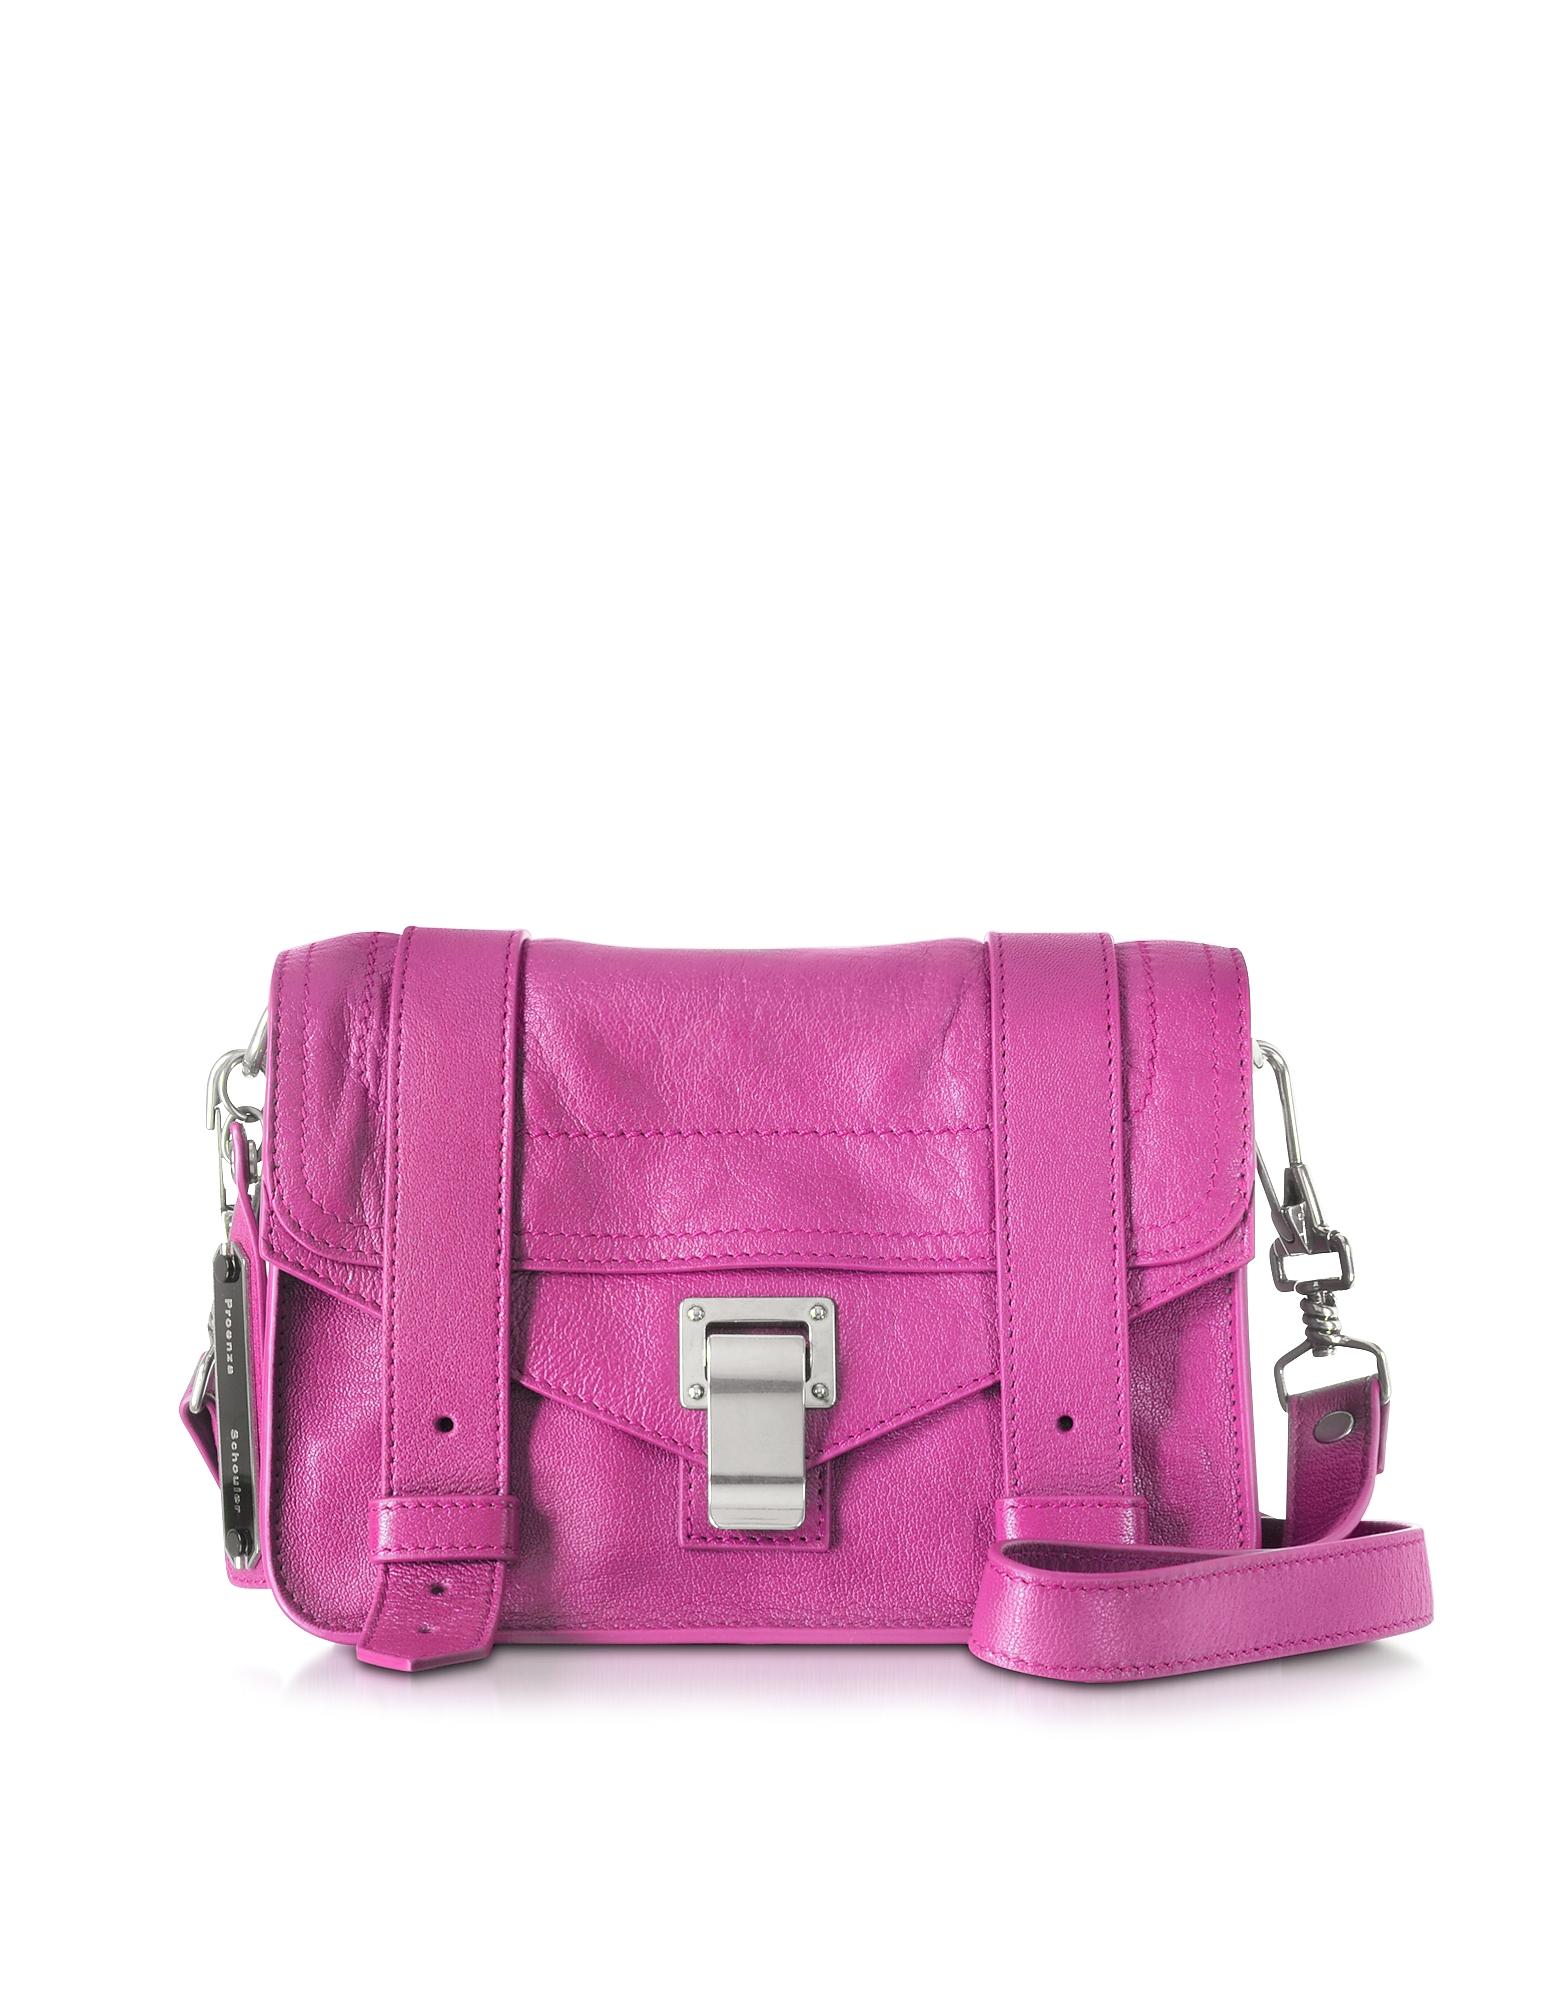 Proenza Schouler Handbags, Berry PS1 Mini Lux Leather Crossbody